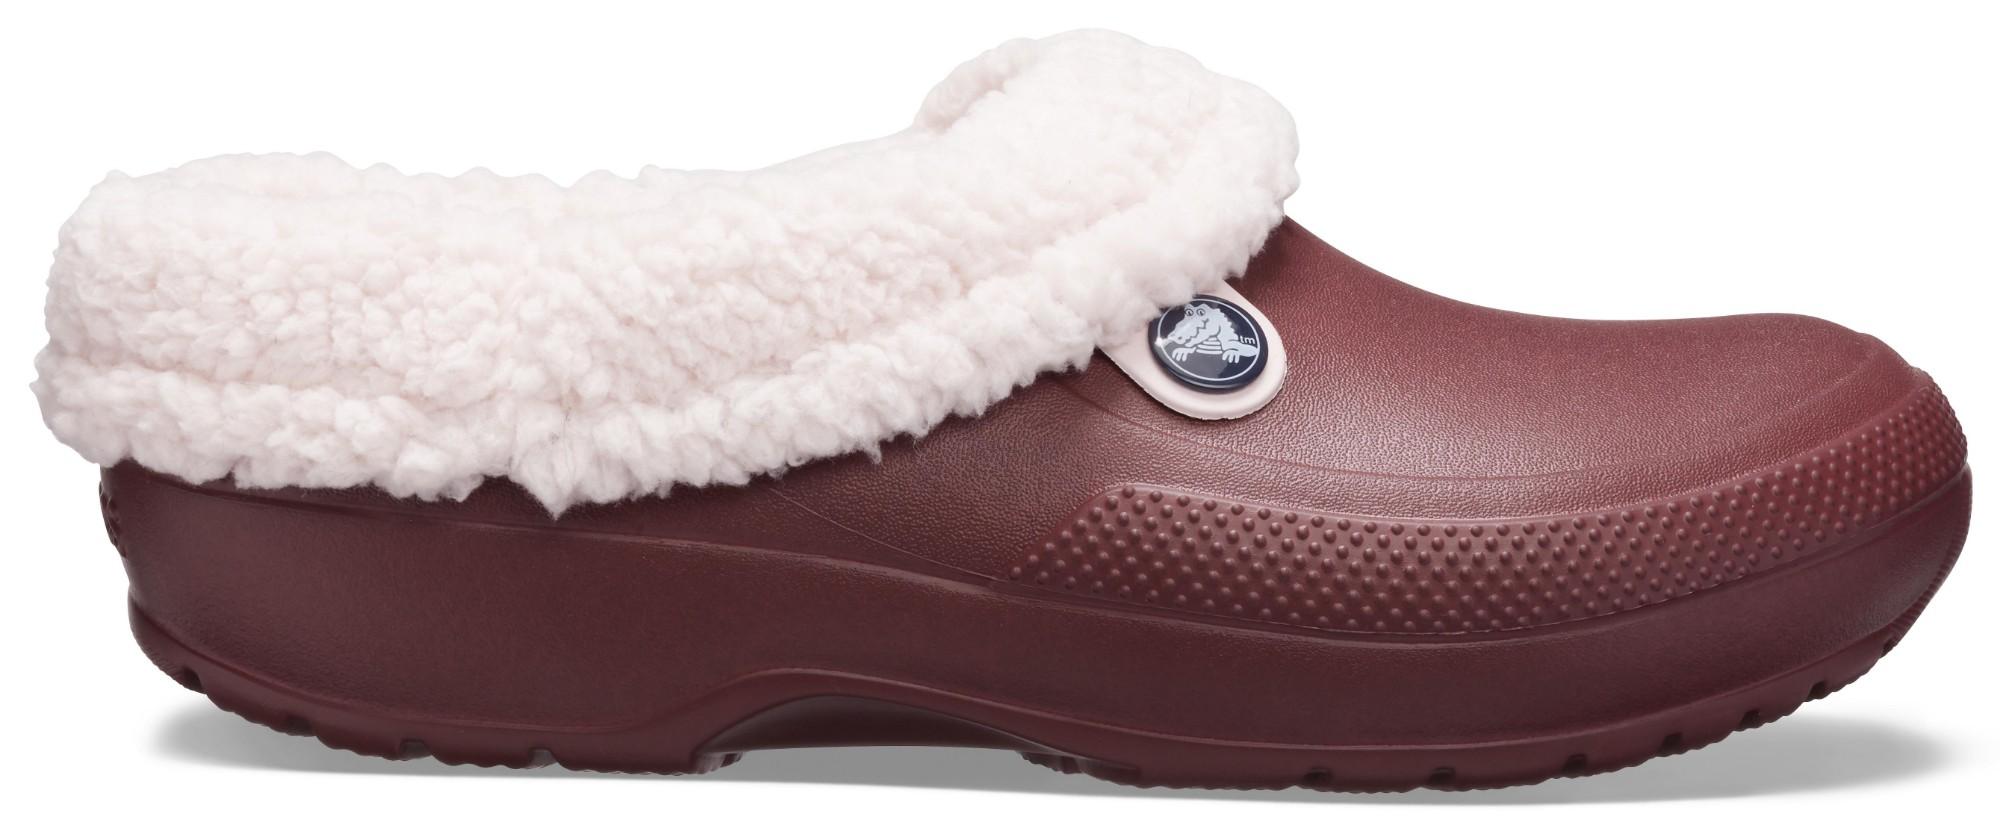 Crocs™ Classic Blitzen III Clog Burgundy/Barely Pink 41